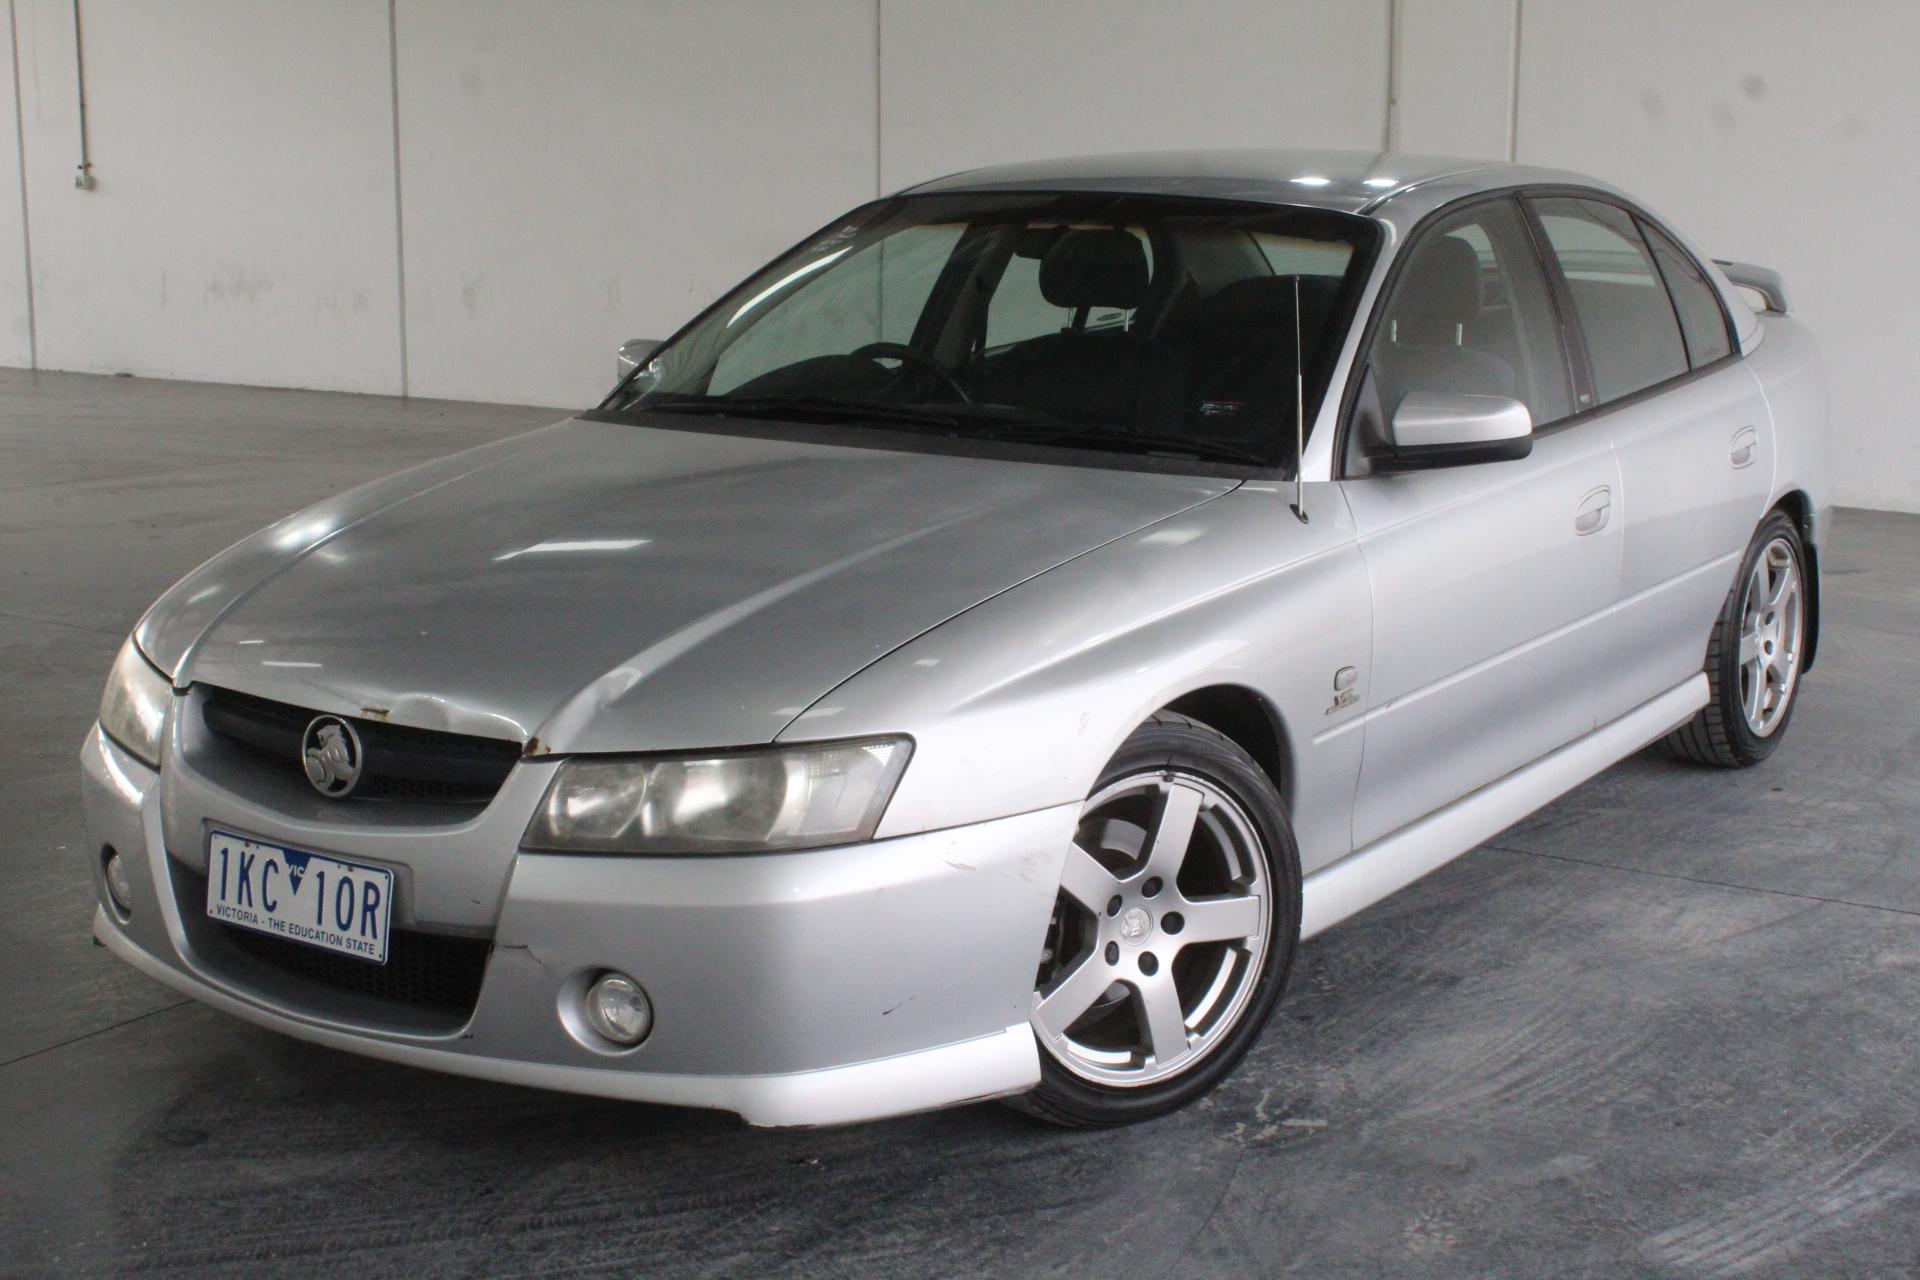 2005 Holden Commodore SV6 VZ Automatic Sedan